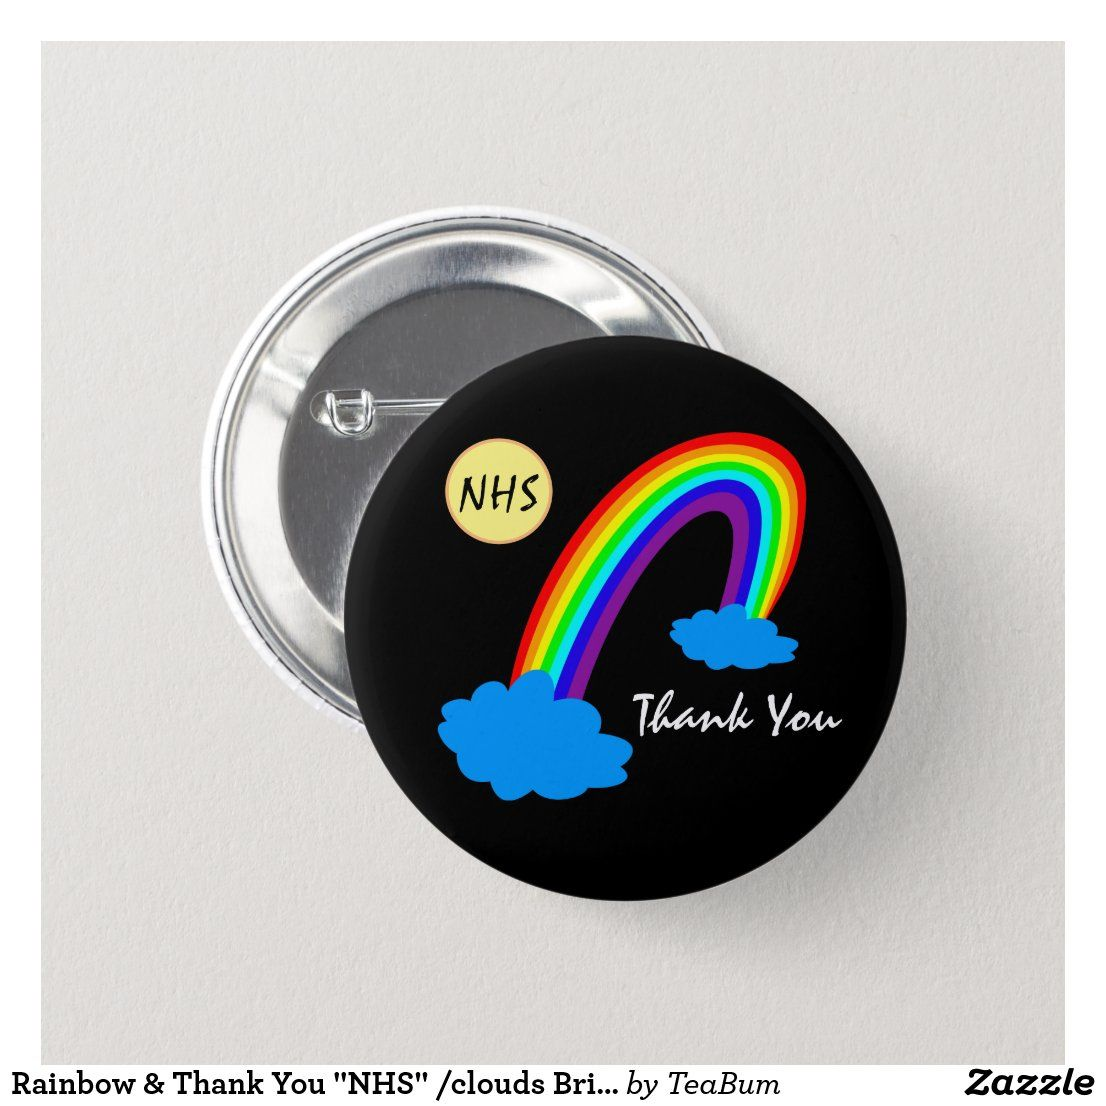 Rainbow Thank You Nhs Clouds Britain Button Zazzle Com